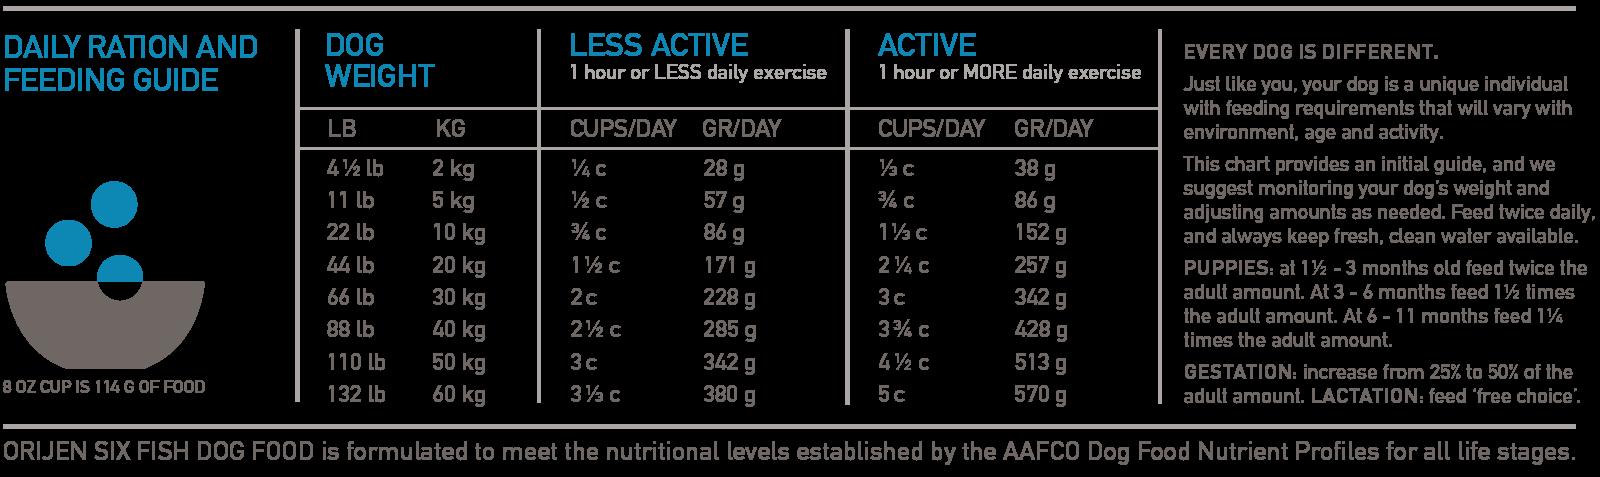 ORIJEN Six Fish Biologically Appropriate Dog Food Feeding Chart